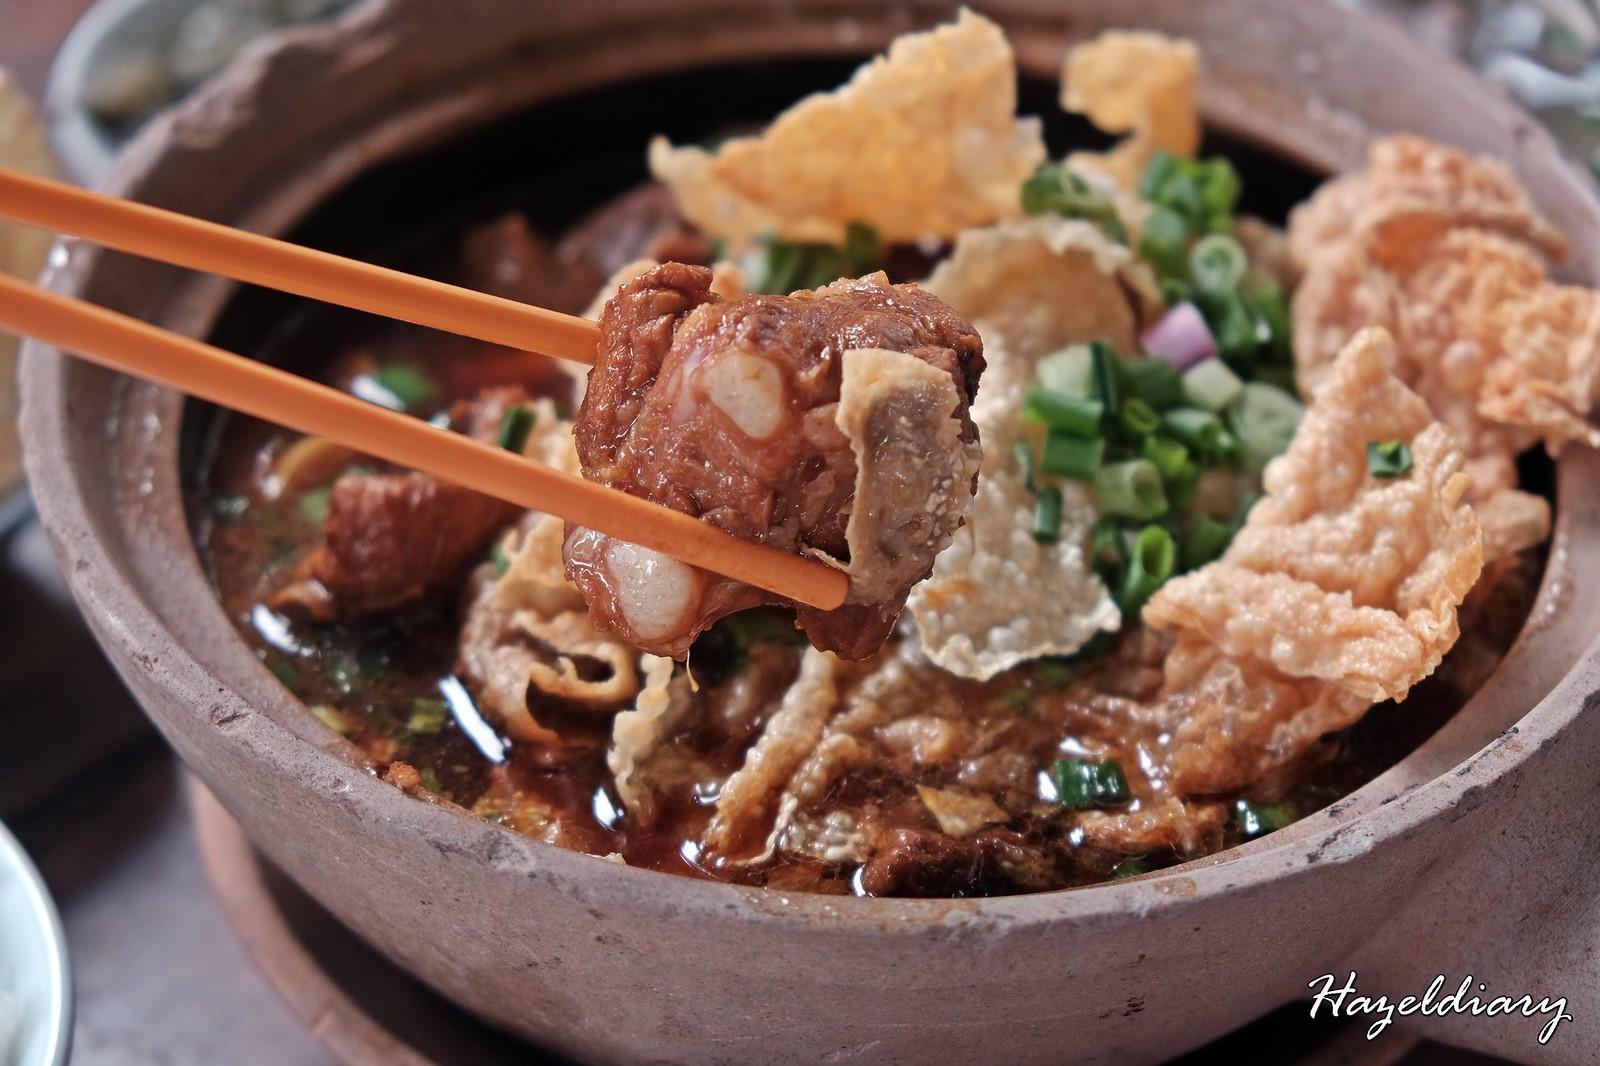 Restoran Kota Zheng Zhong-Bak Kut Teh-Hazeldiary-1